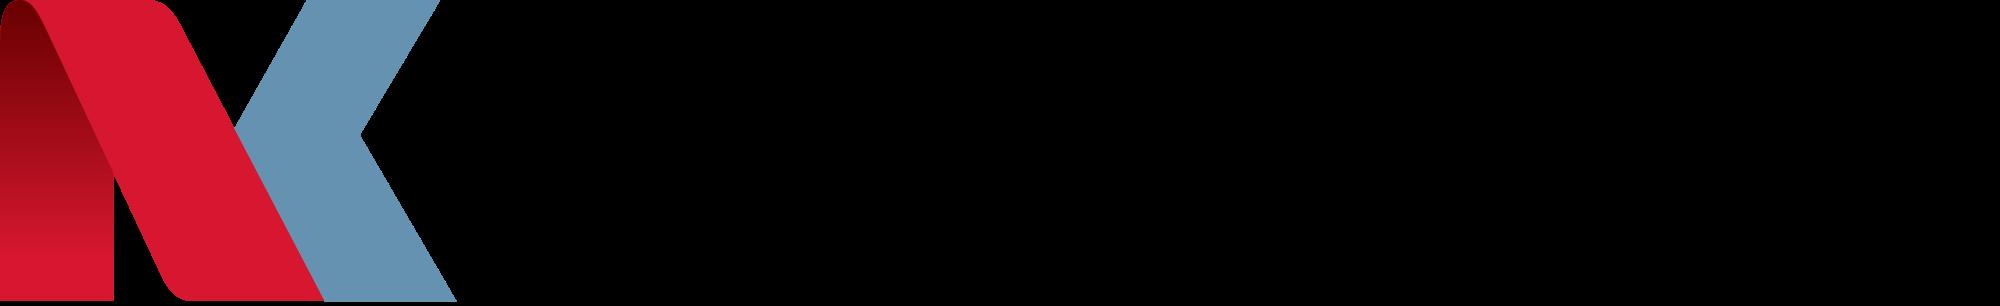 Nikkatsu Corporation